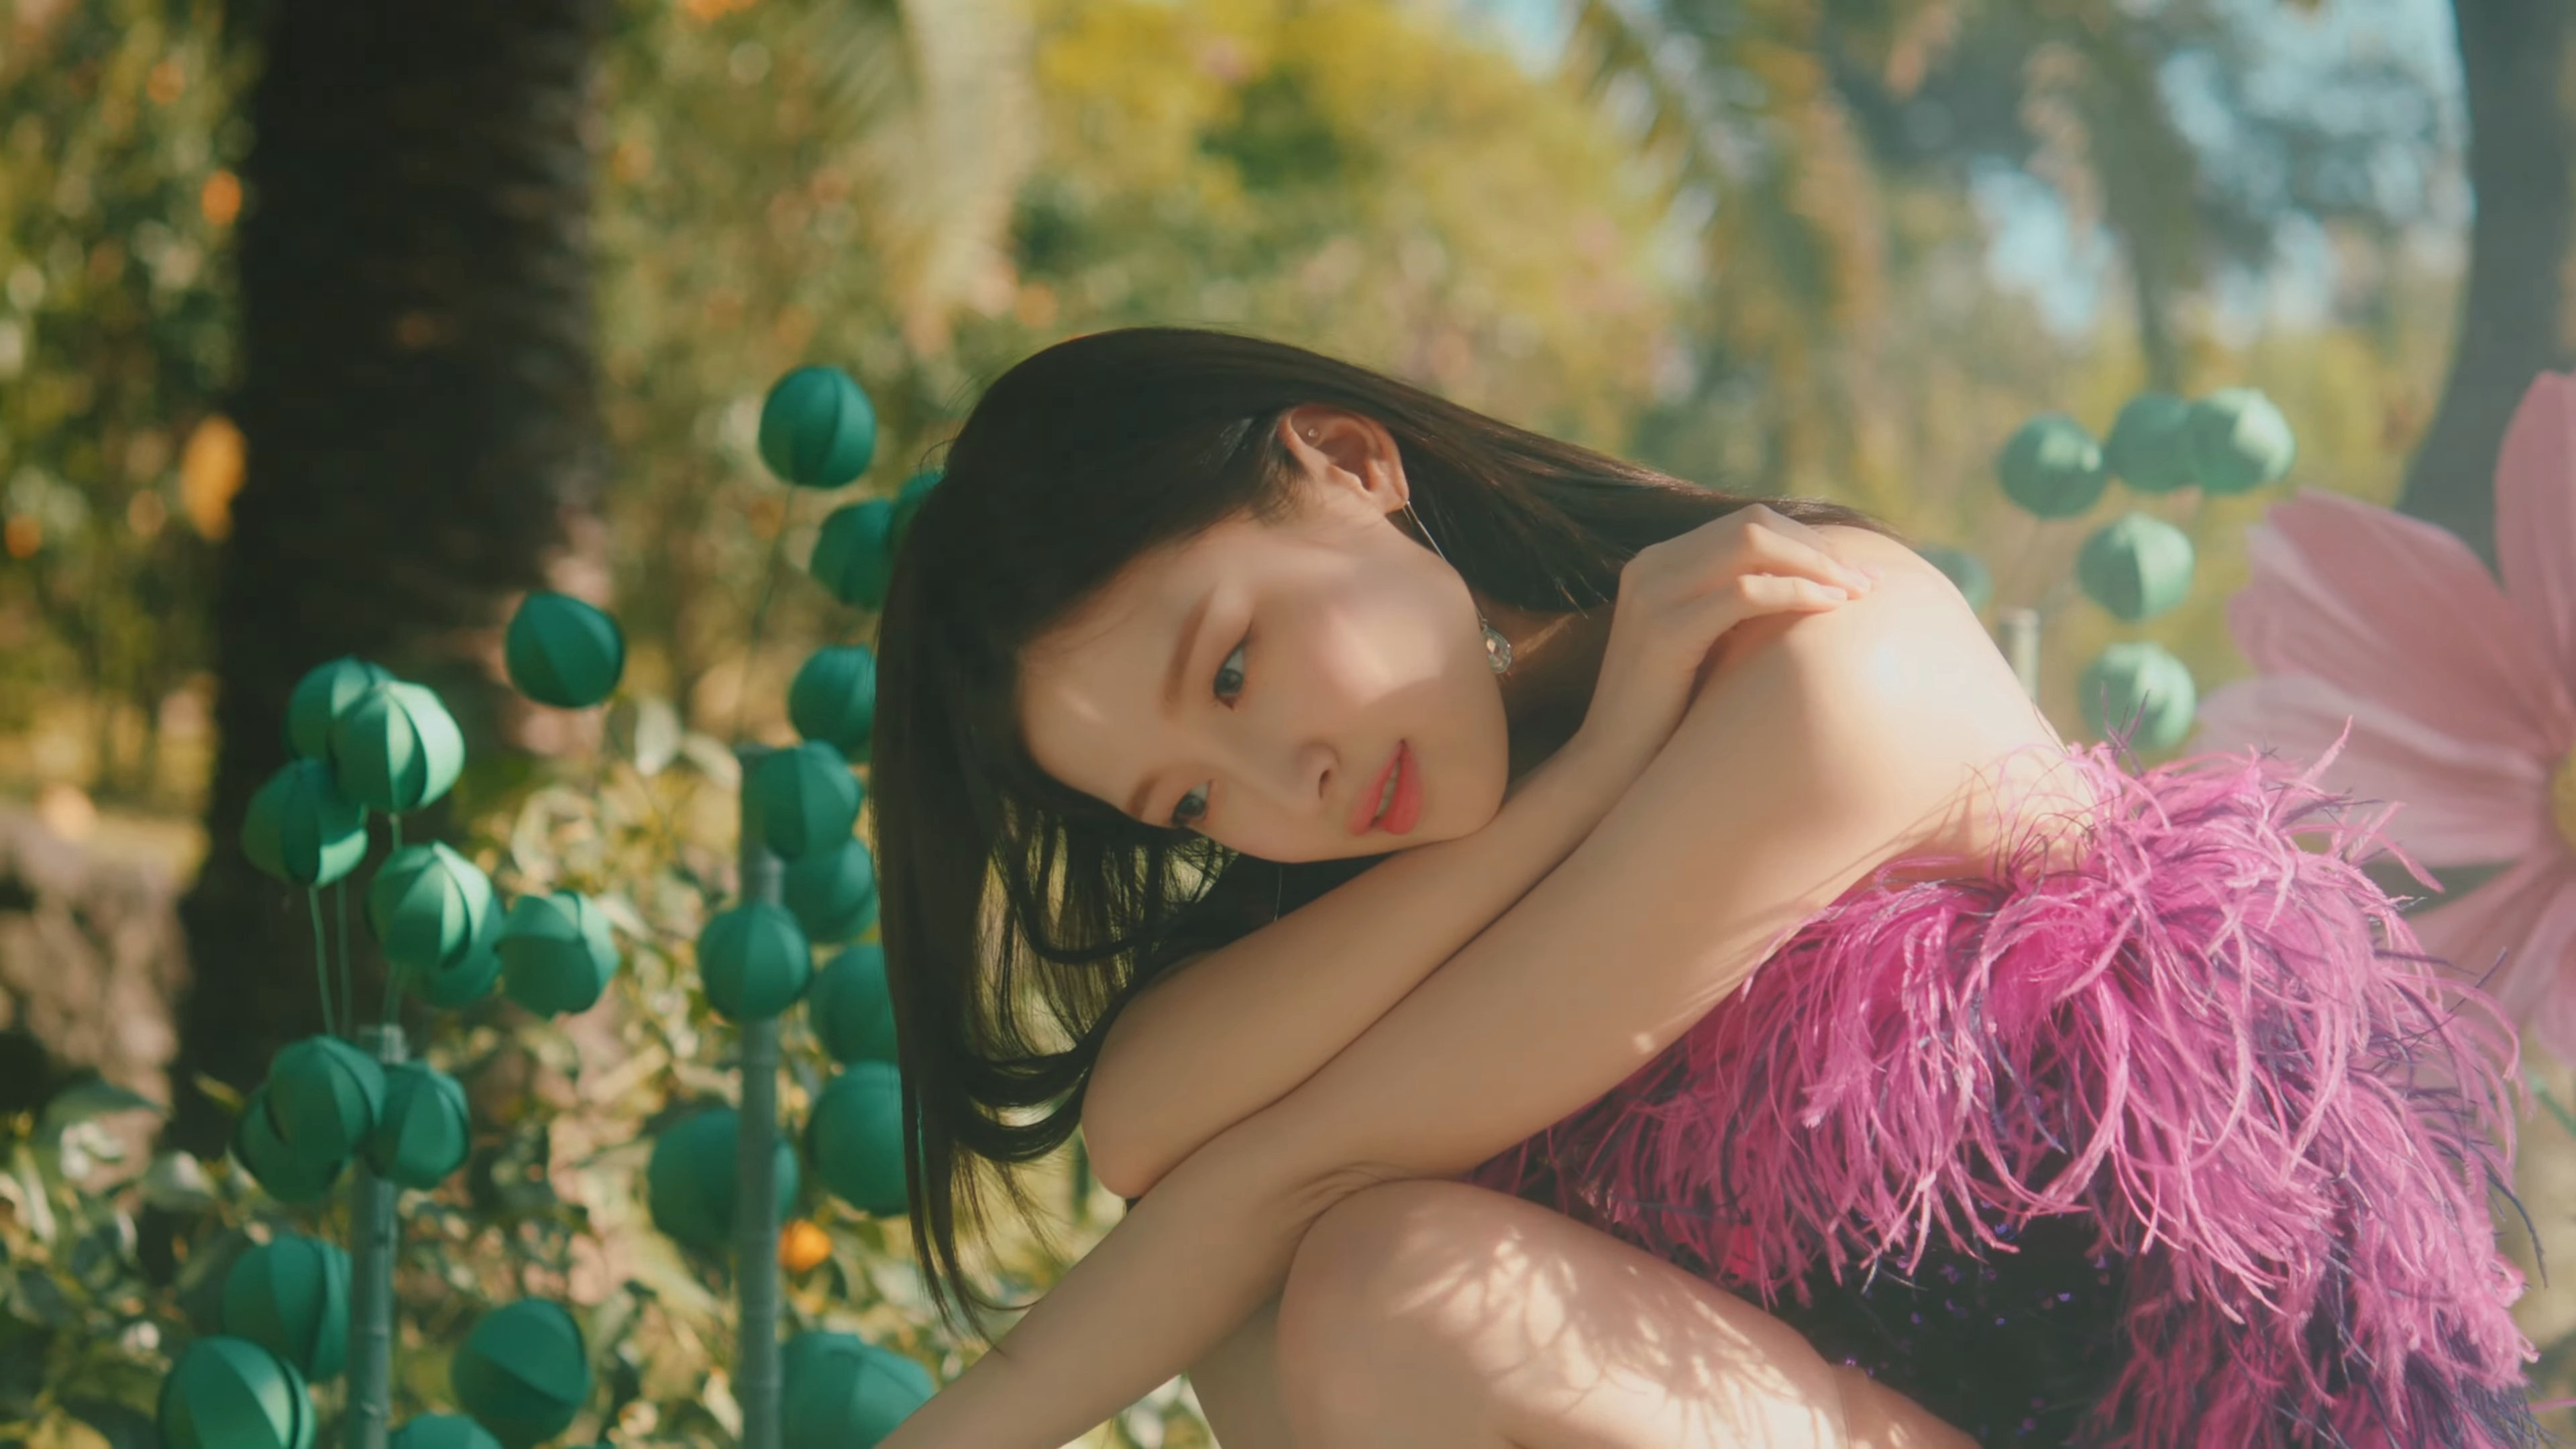 Oh_My_Girl_Dun_Dun_Dance_Arin_2